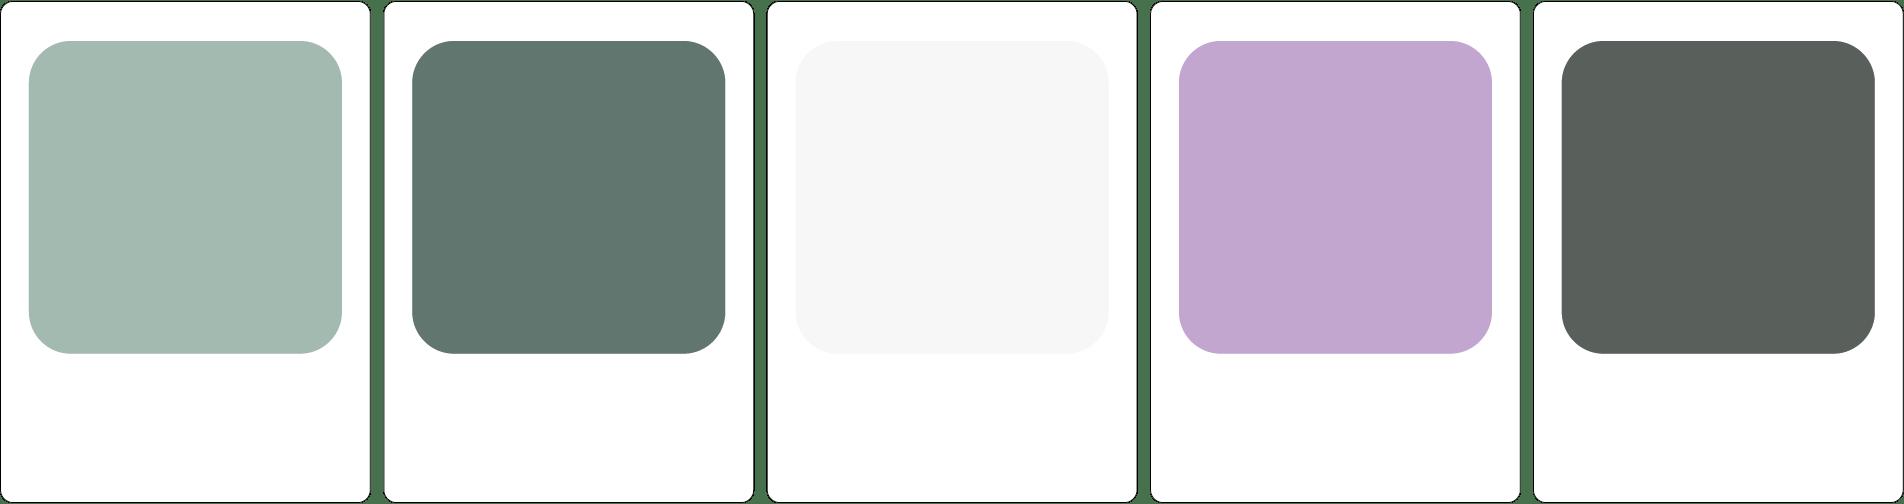 Kleurenpalet marieke jacobs